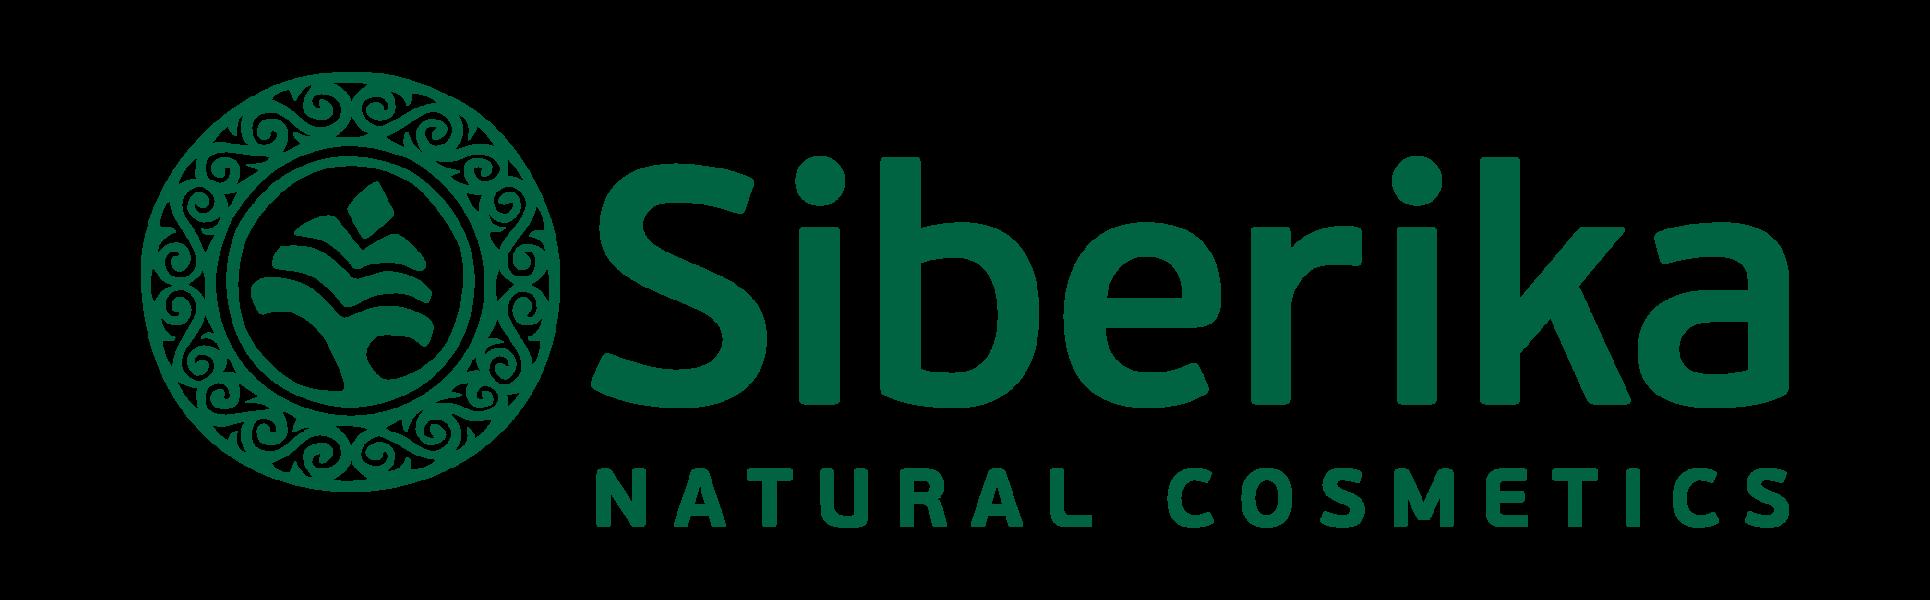 Siberika Natural Cosmetics-1